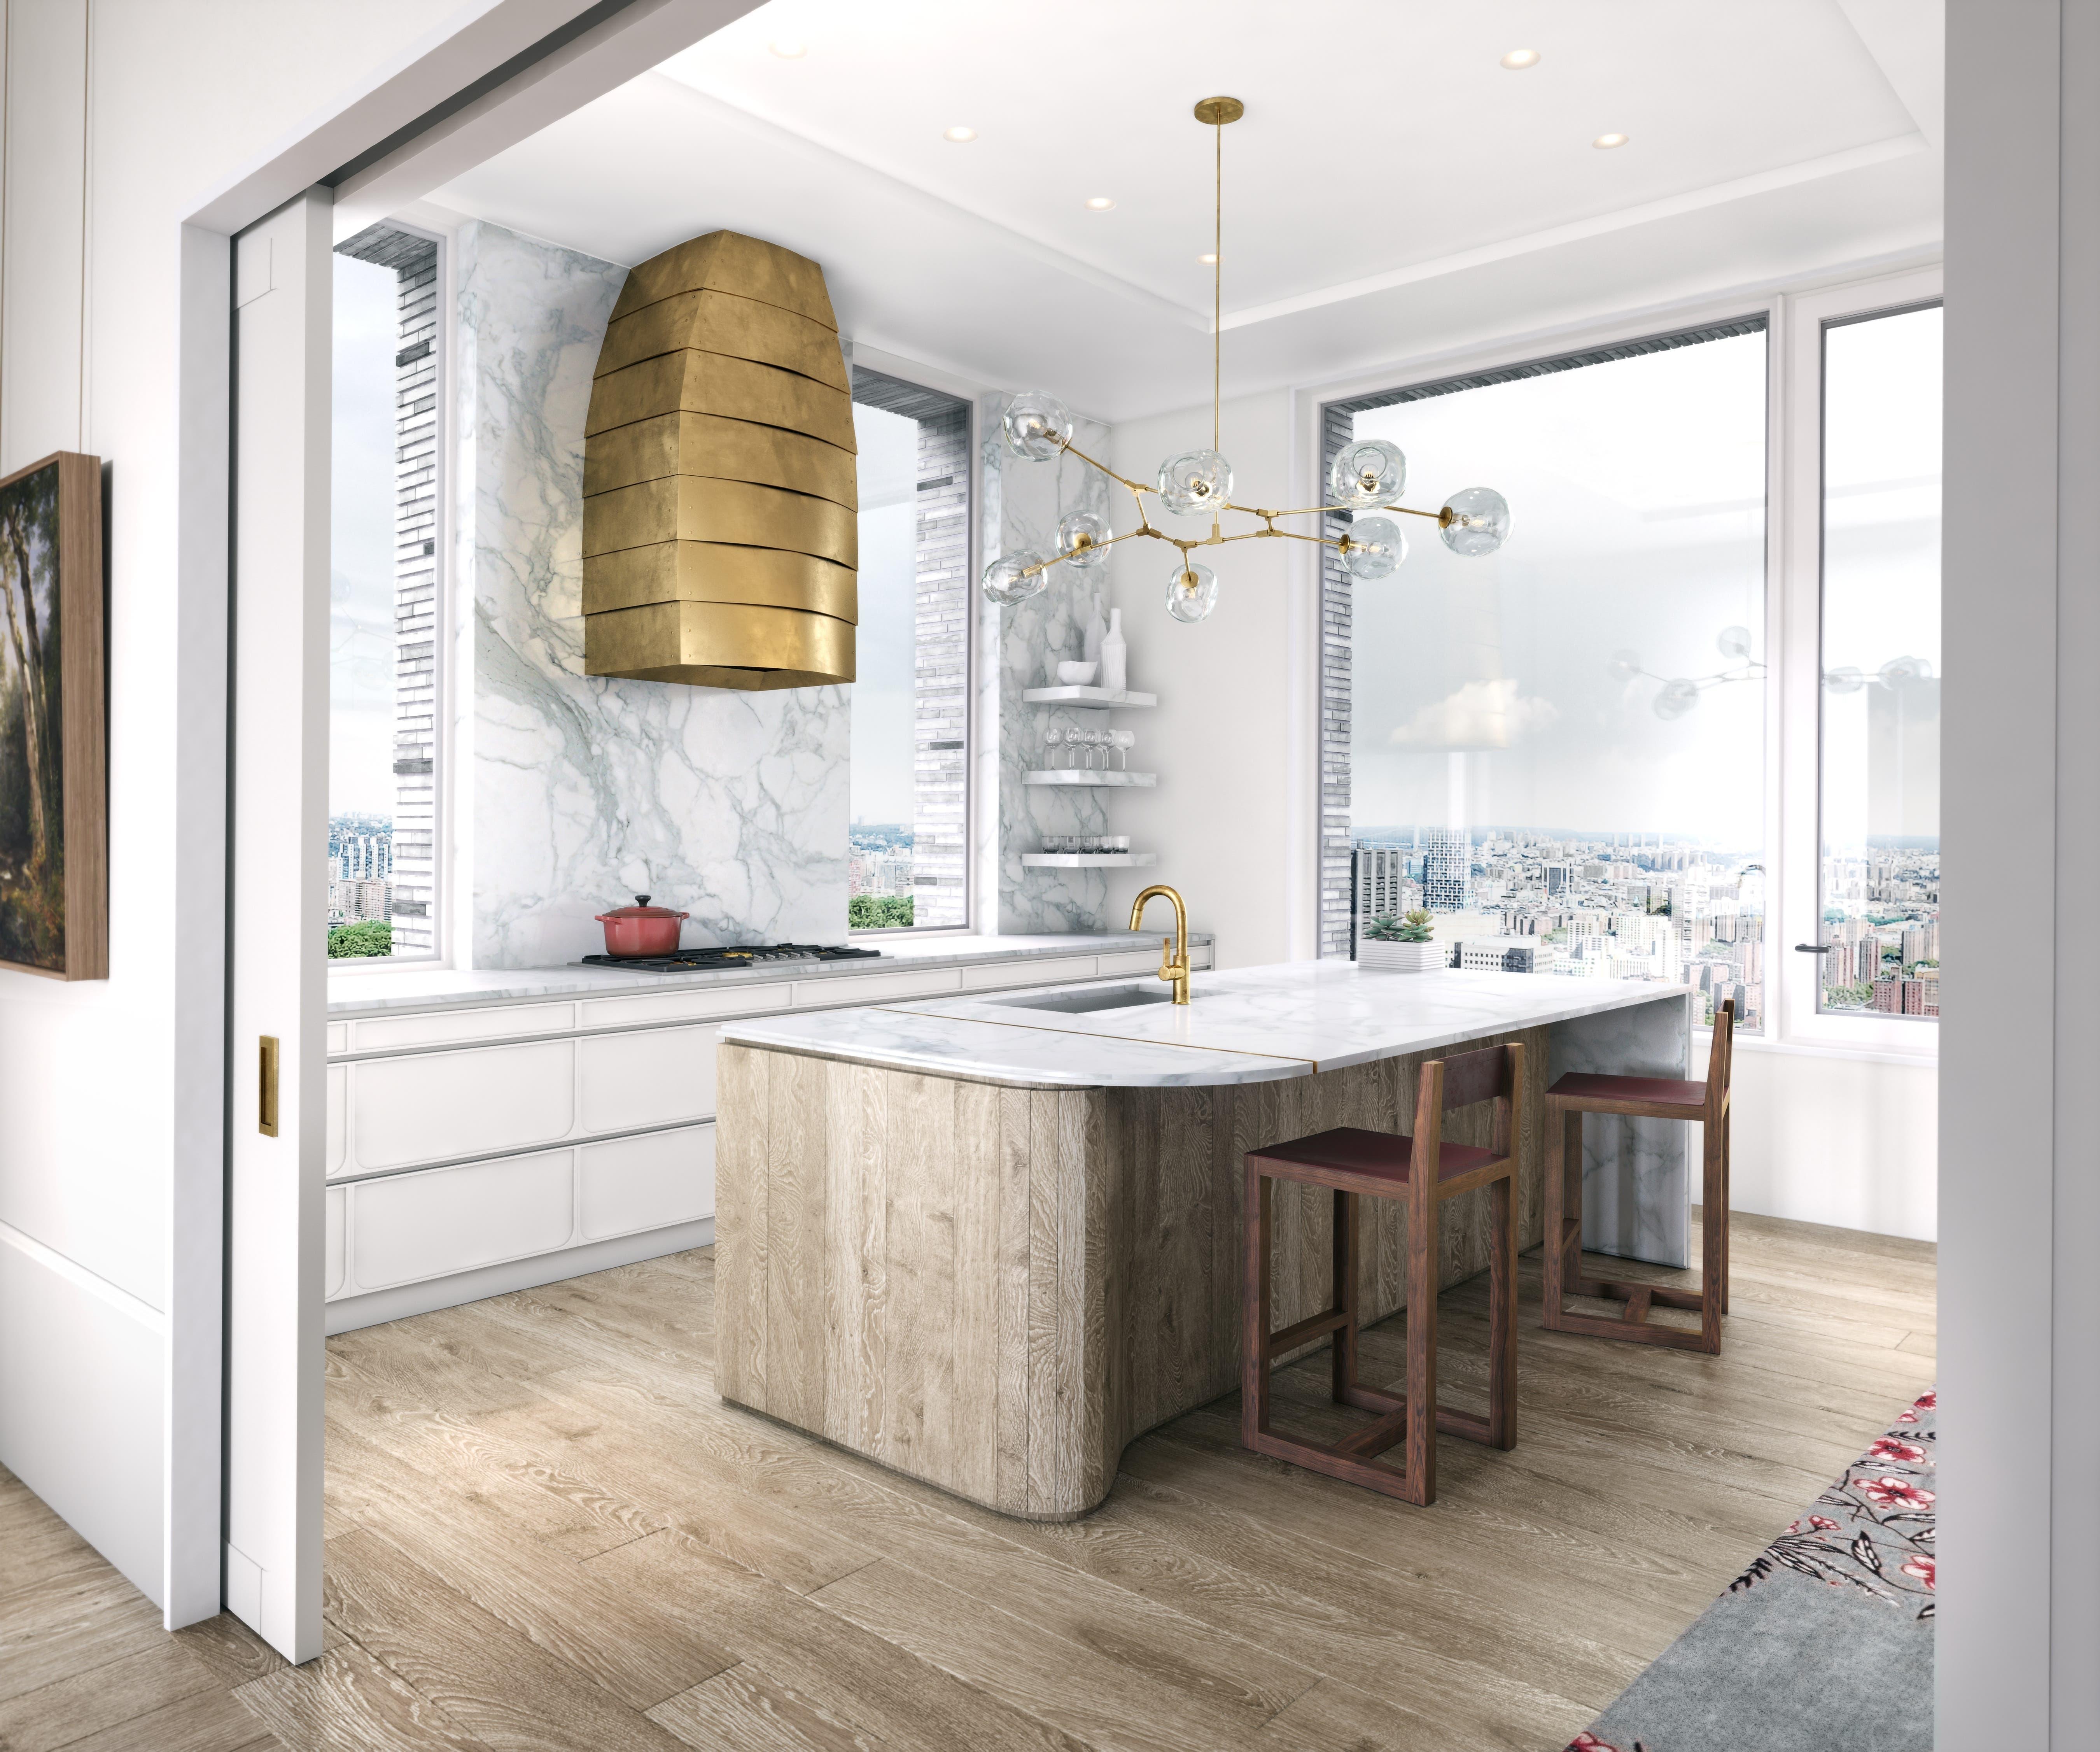 Die US-Firma Arrigoni Woods hat sich in New York City um den Holzausbau beim Projekt 180 East 88th Street gekümmert.